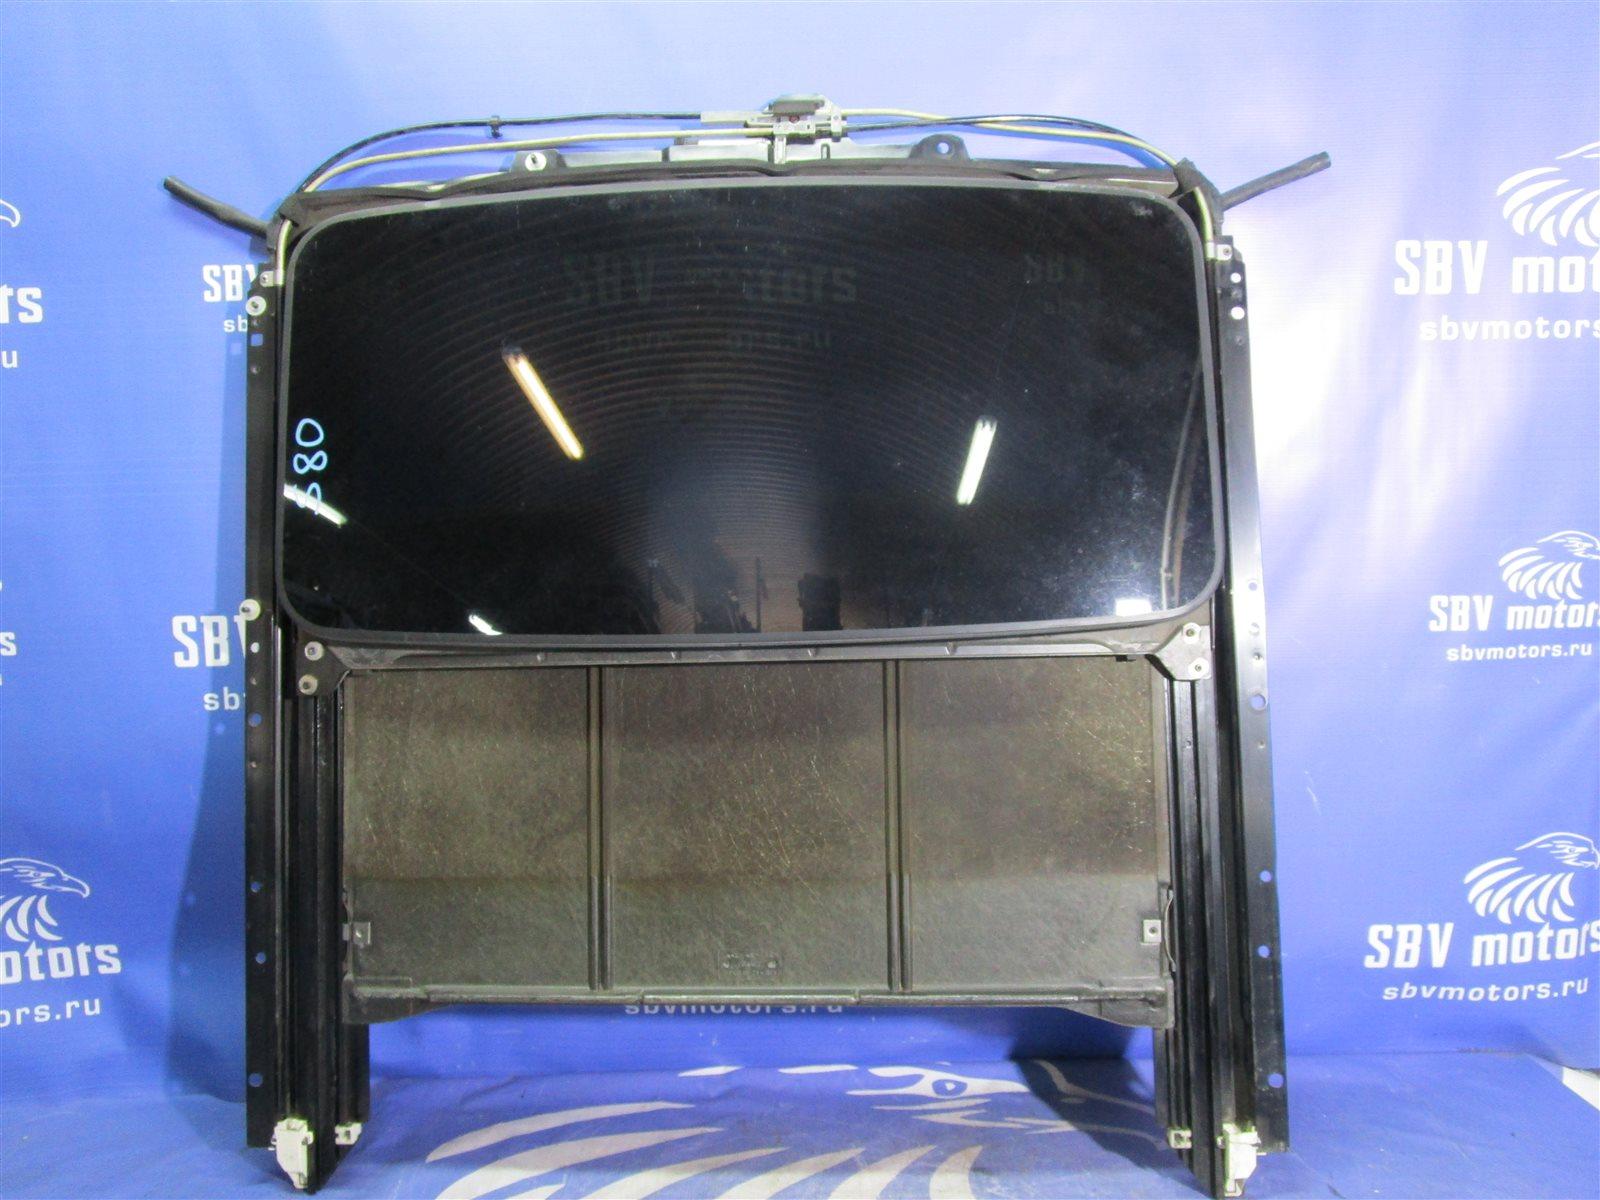 Люк в сборе электрический Volvo S80 B6324S верхний